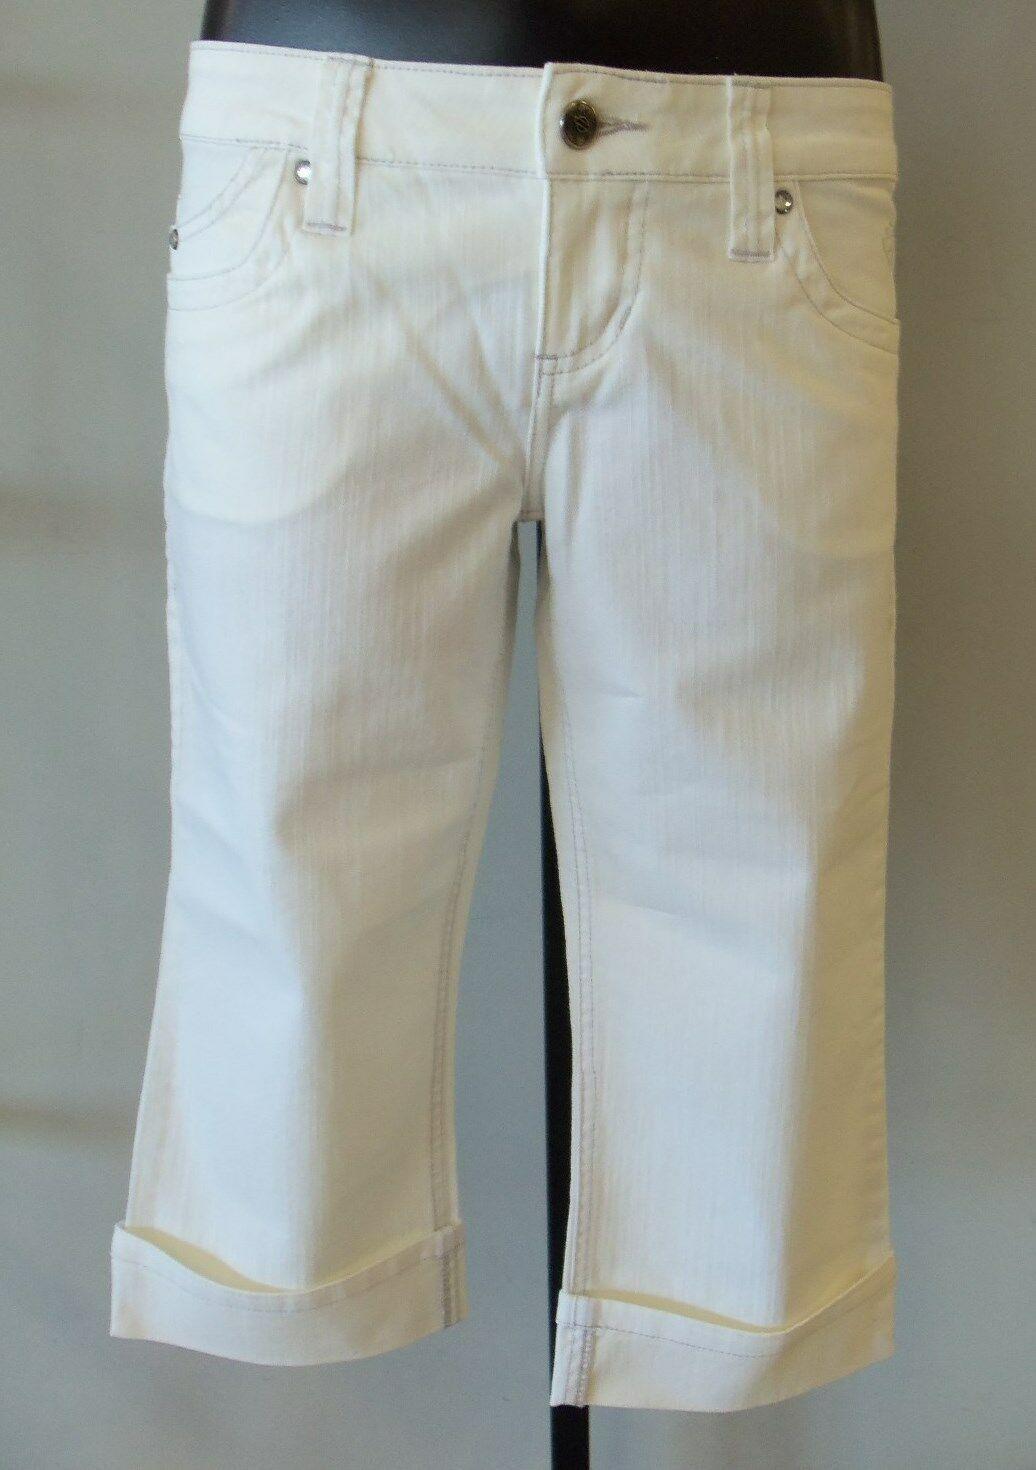 Harley Davidson Women's White Denim Capri Pants